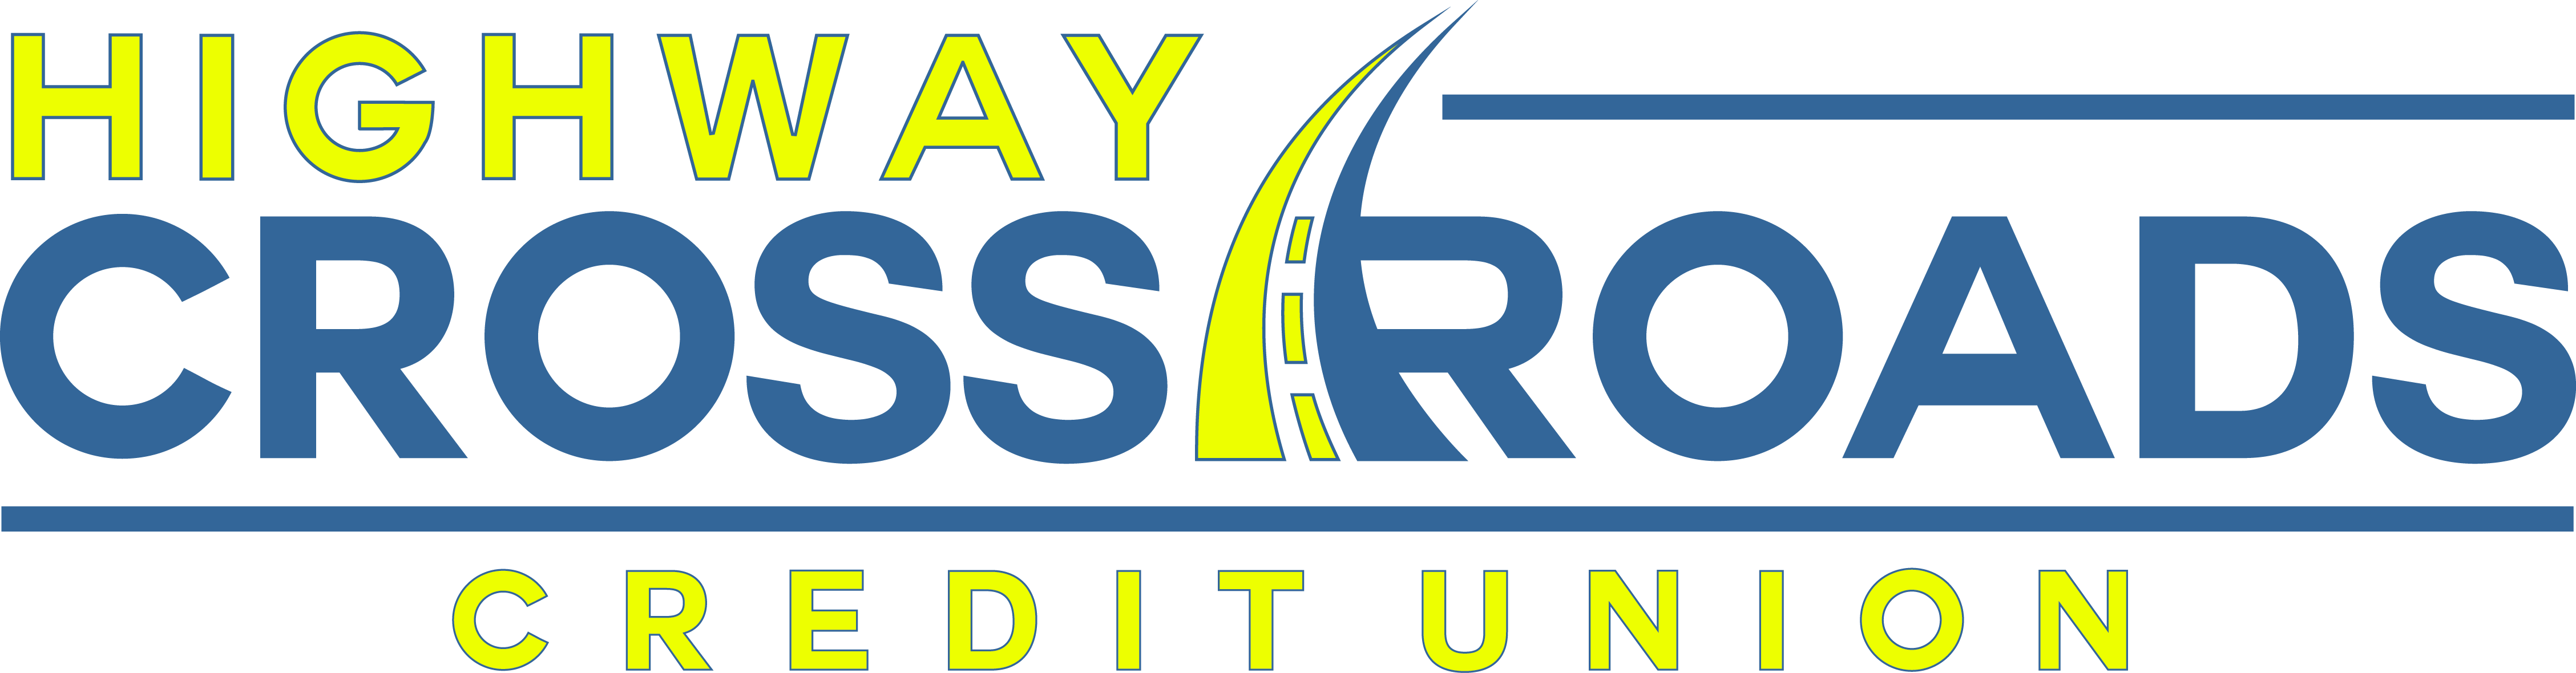 Highway Crossroads Color Logo